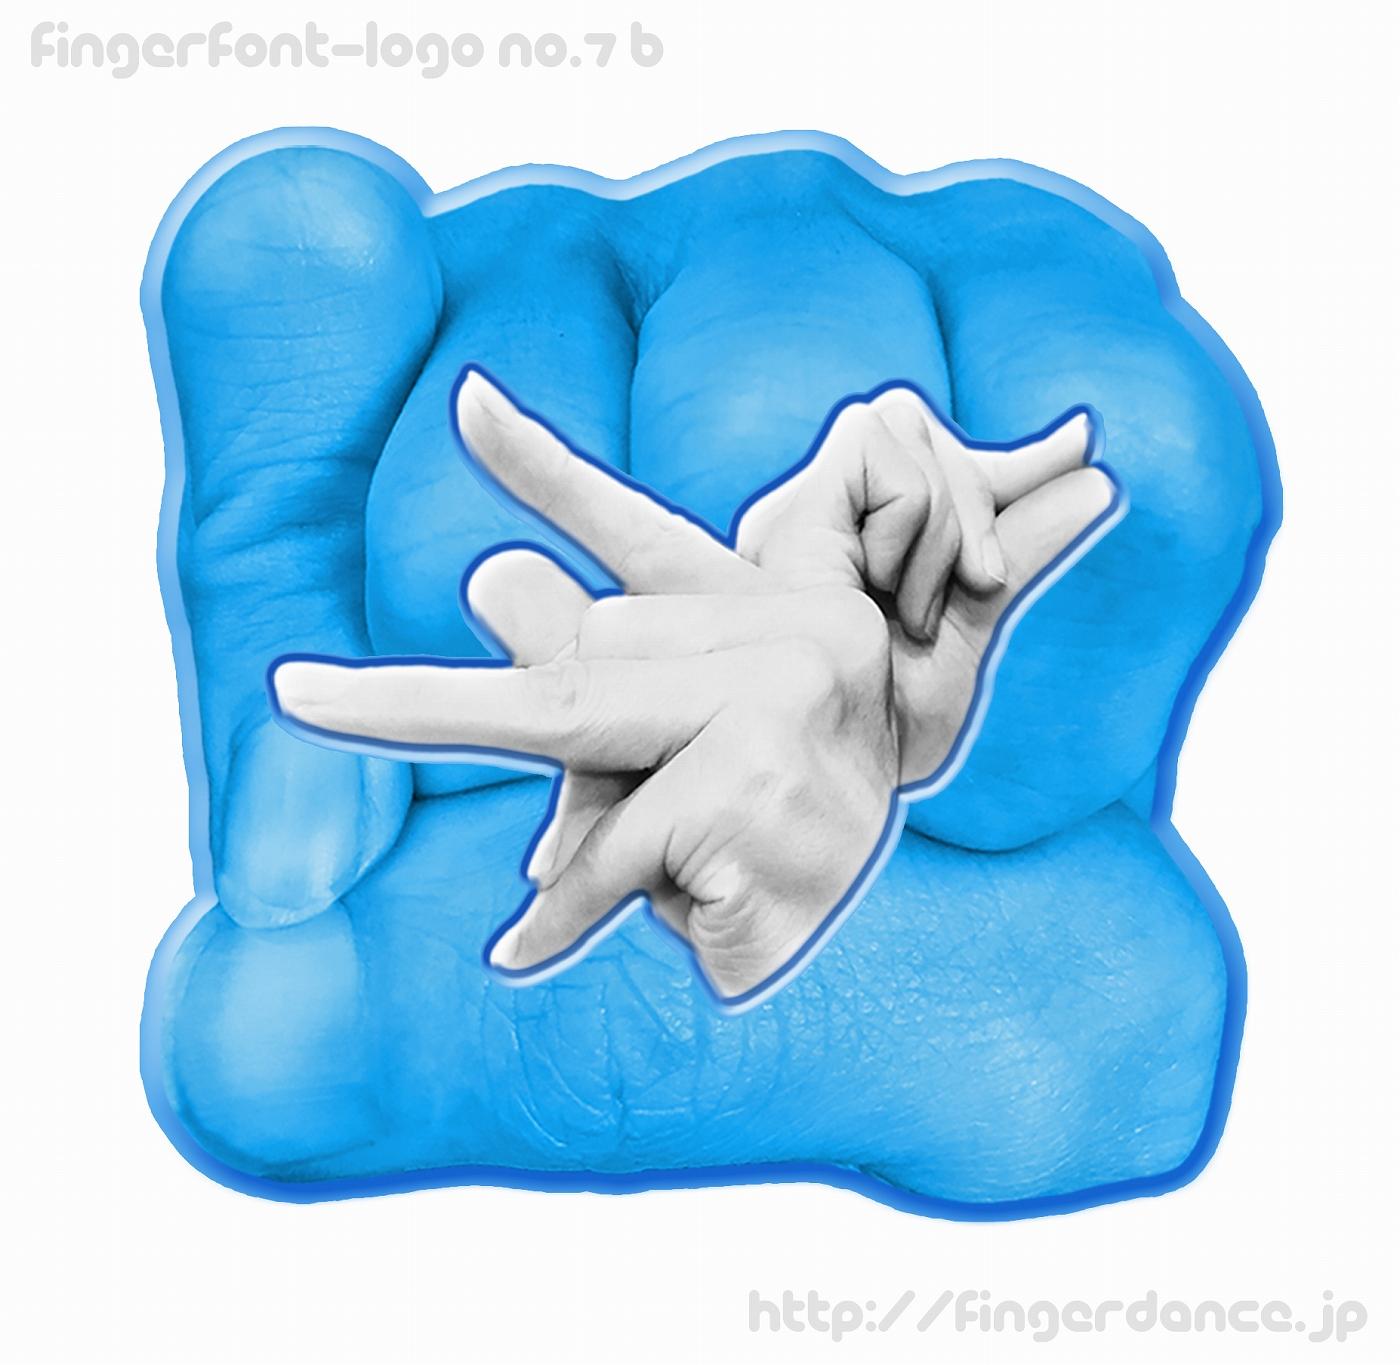 twitter-fingerhttp://fingerdance.jp/L/logohand ツイッター・フィンガーロゴハンド 手指